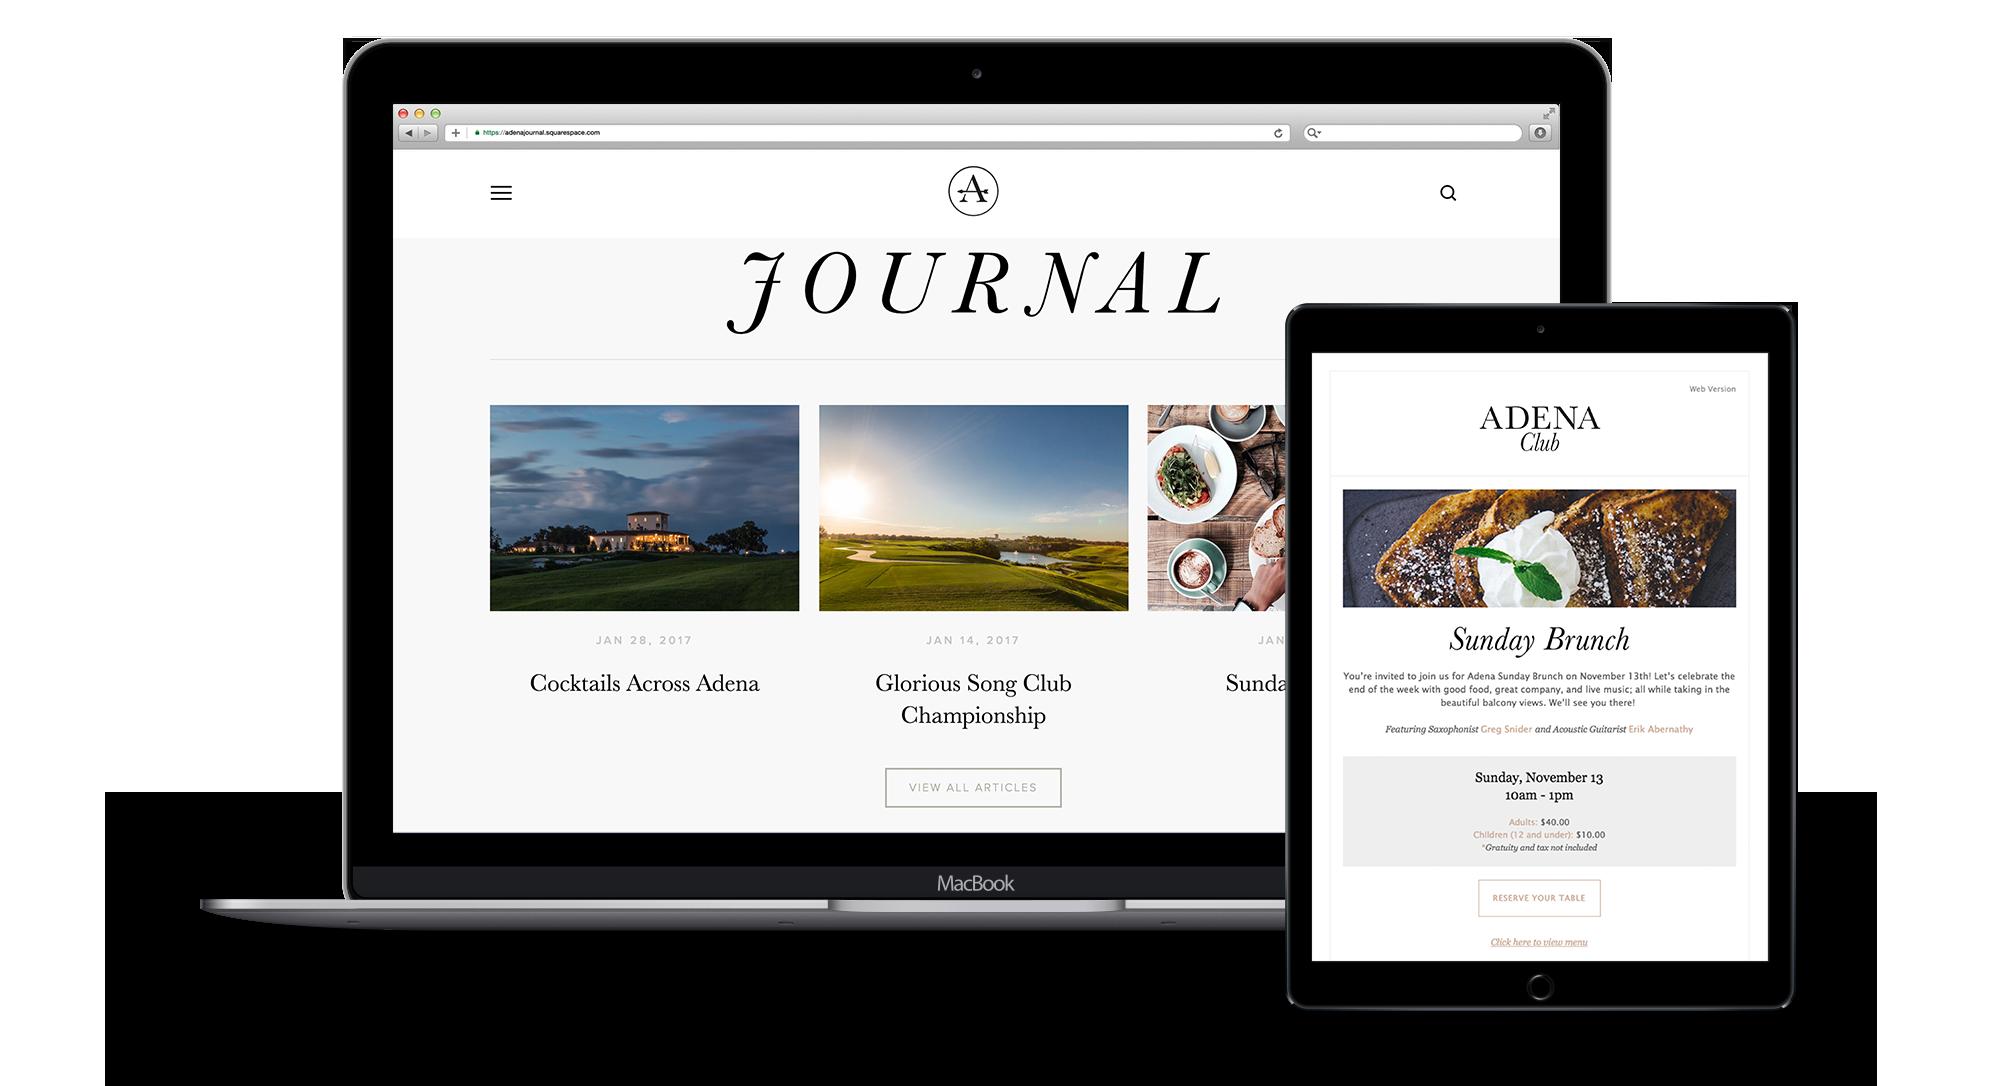 journal-laptop.png